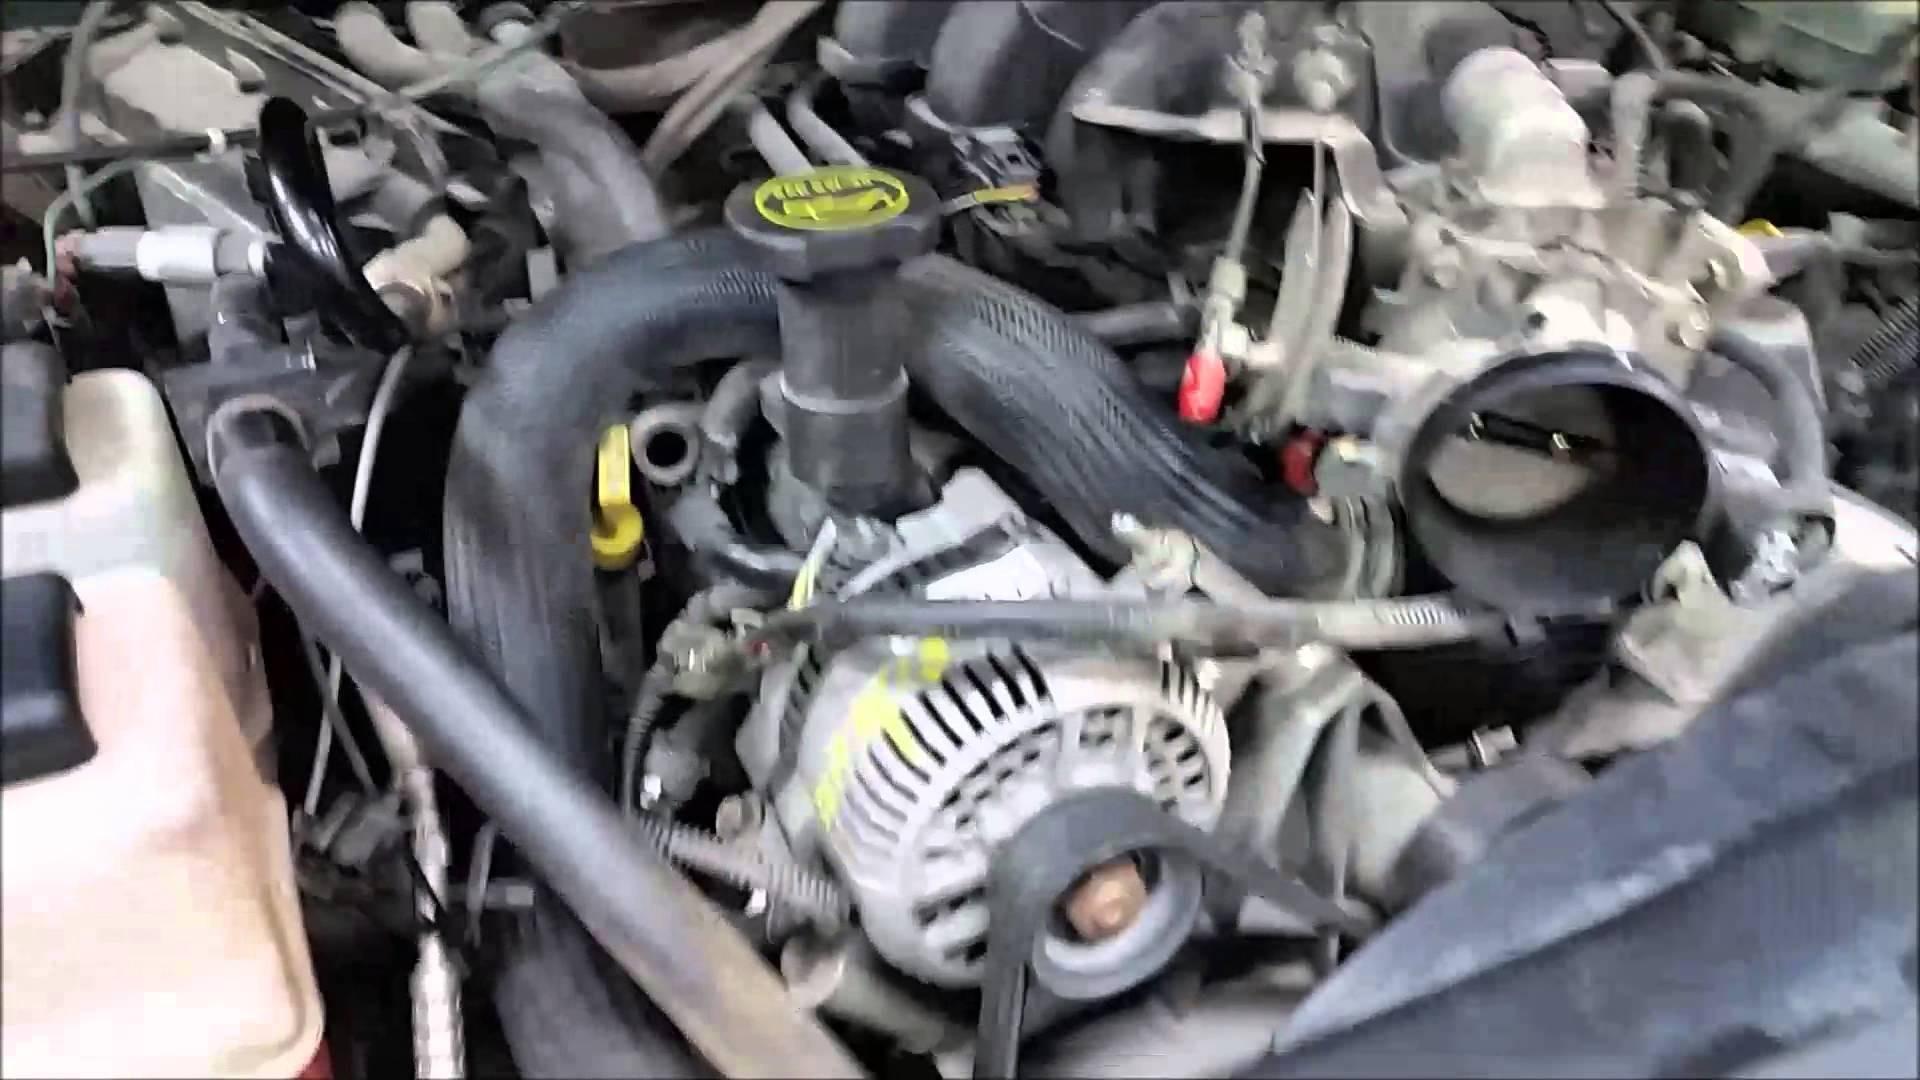 1999 ford 4 6 engine diagram schema wiring diagram 3.0L Vulcan Engine Diagram 1999 ford 4 0 engine diagram data wiring diagram schematic ford 302 engine truck 1999 ford 4 6 engine diagram